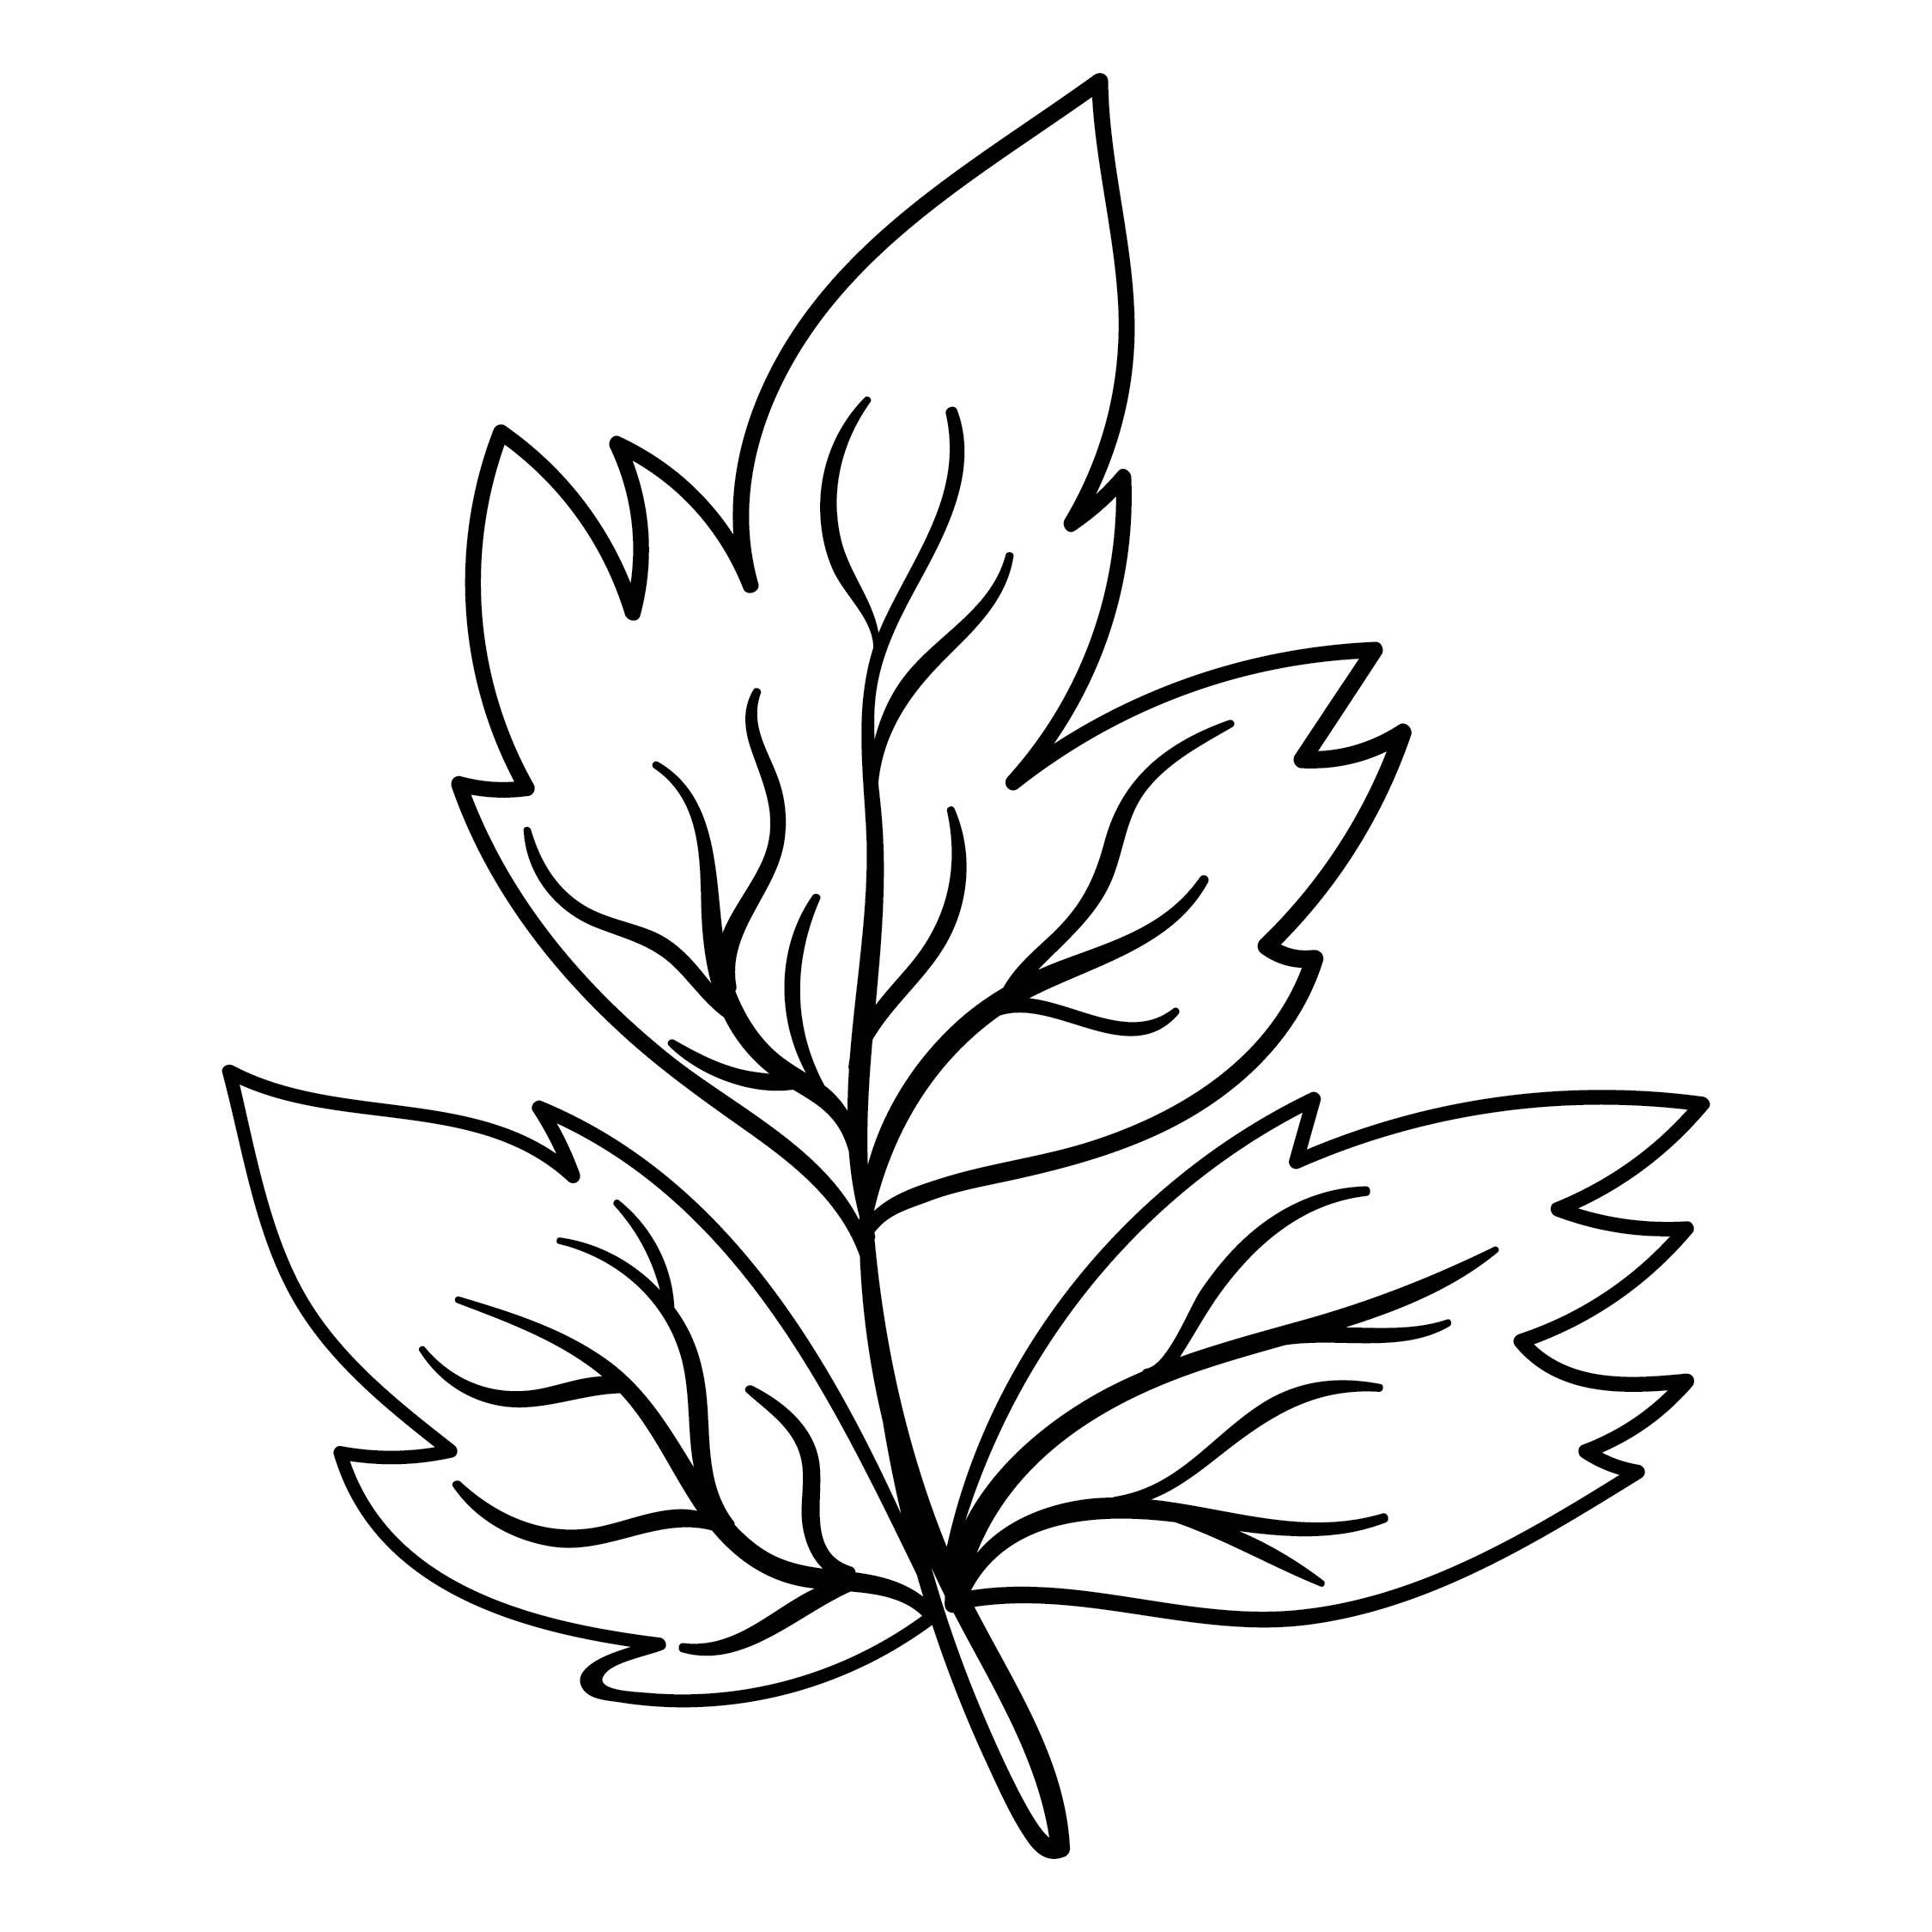 6 Best Images of Oak Leaf Template Printable - Acorn ...